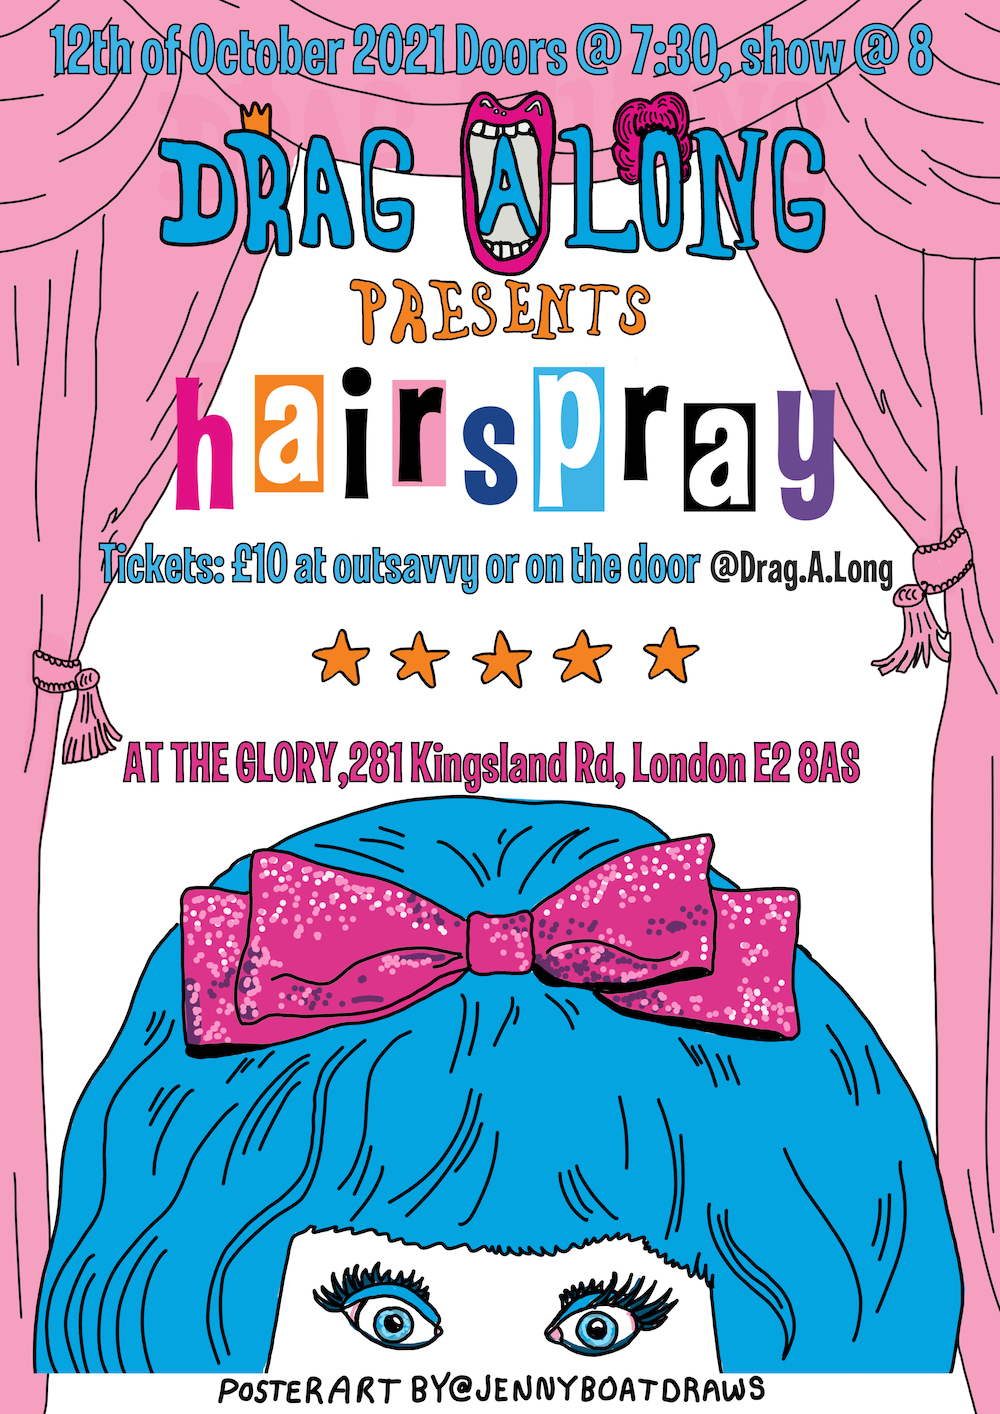 Drag-a-long: Hairspray